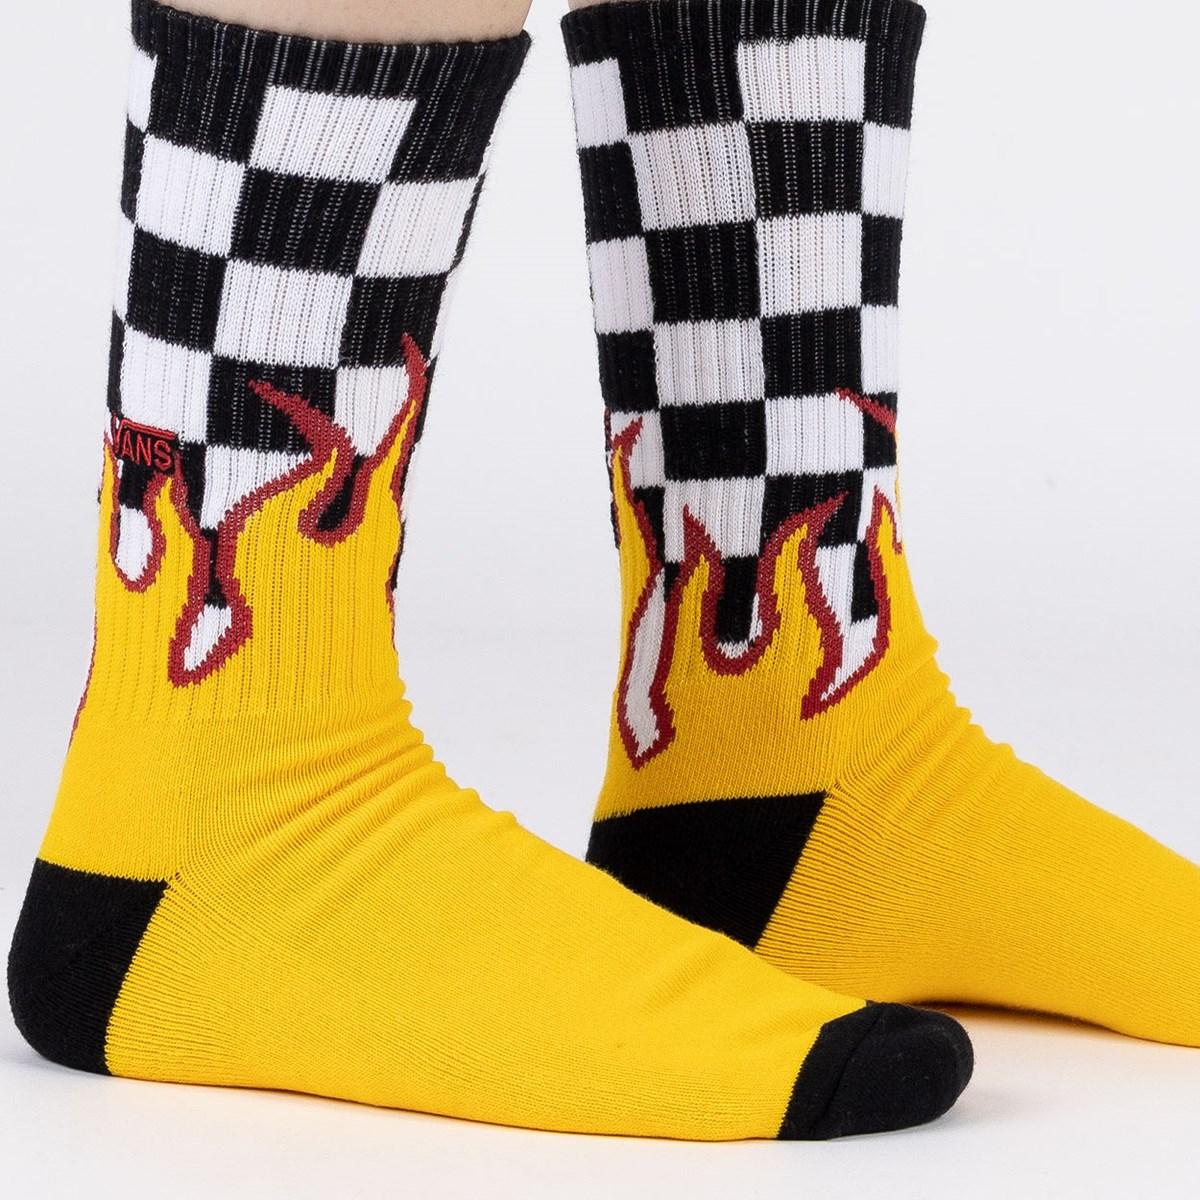 Meia Vans Flame Check Crew Black White VN0A4TQHZIA